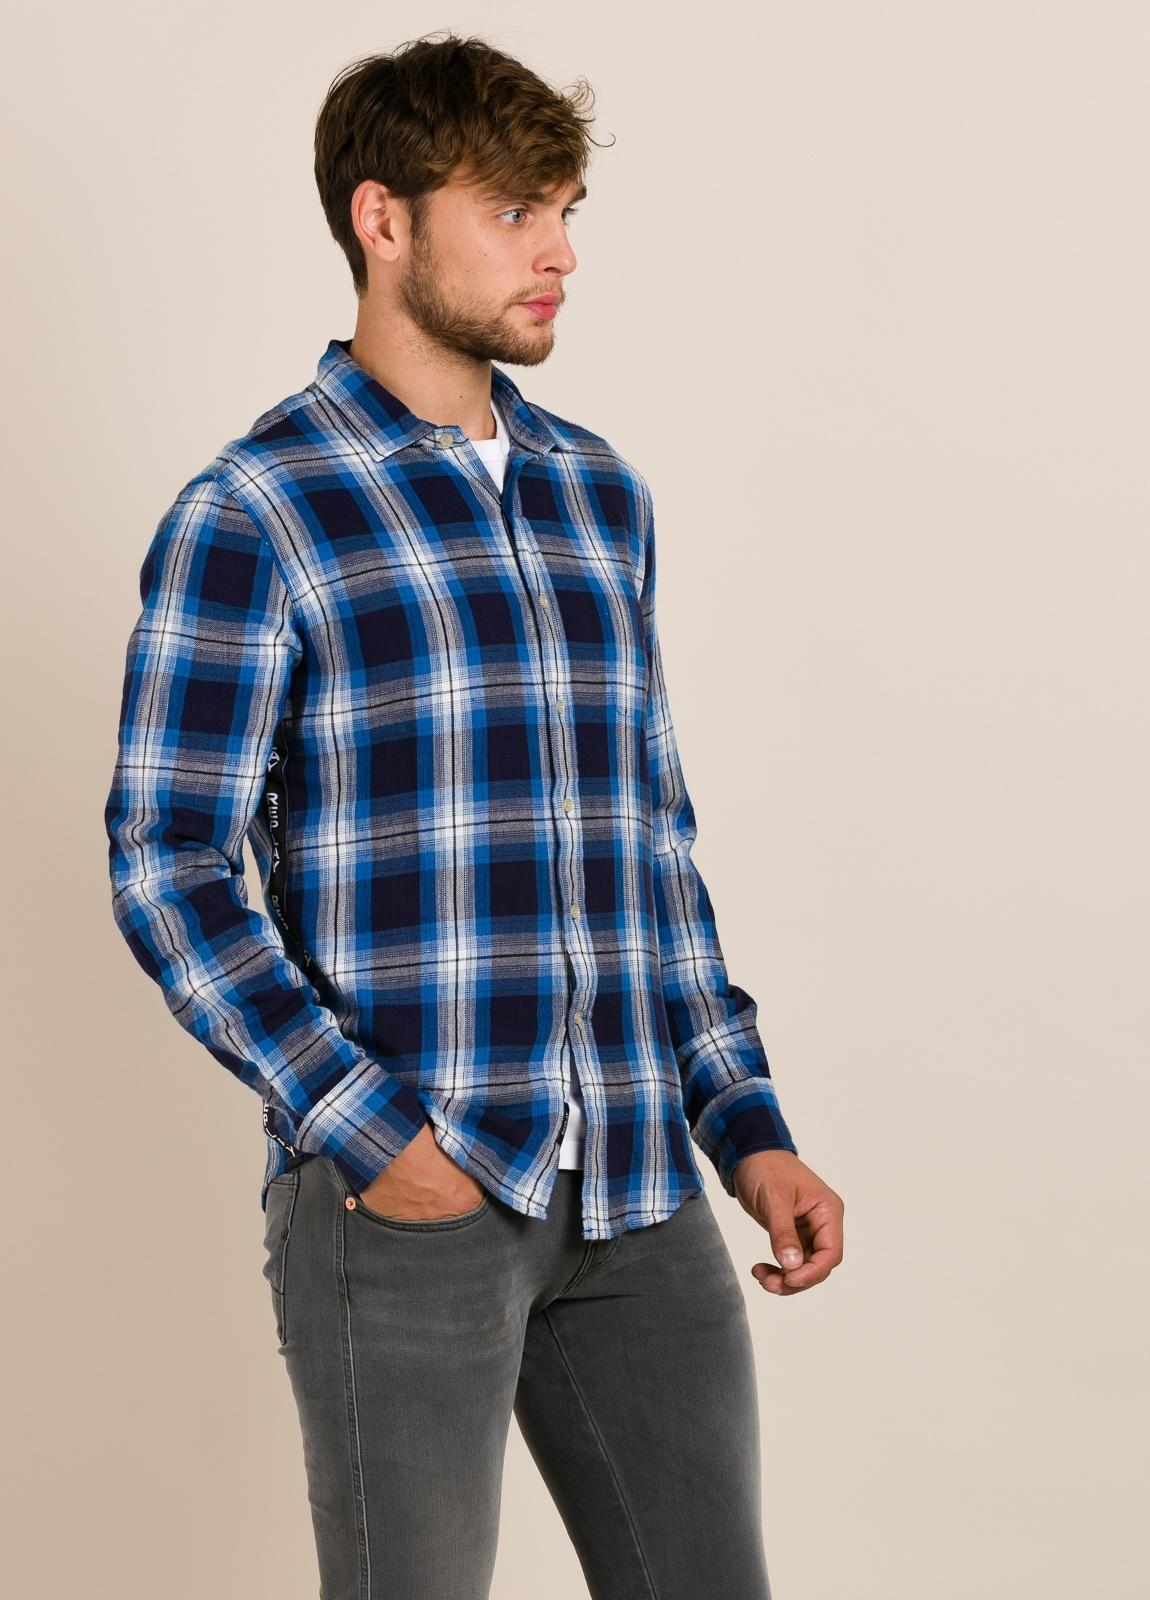 Camisa REPLAY cuadros azules - Ítem1